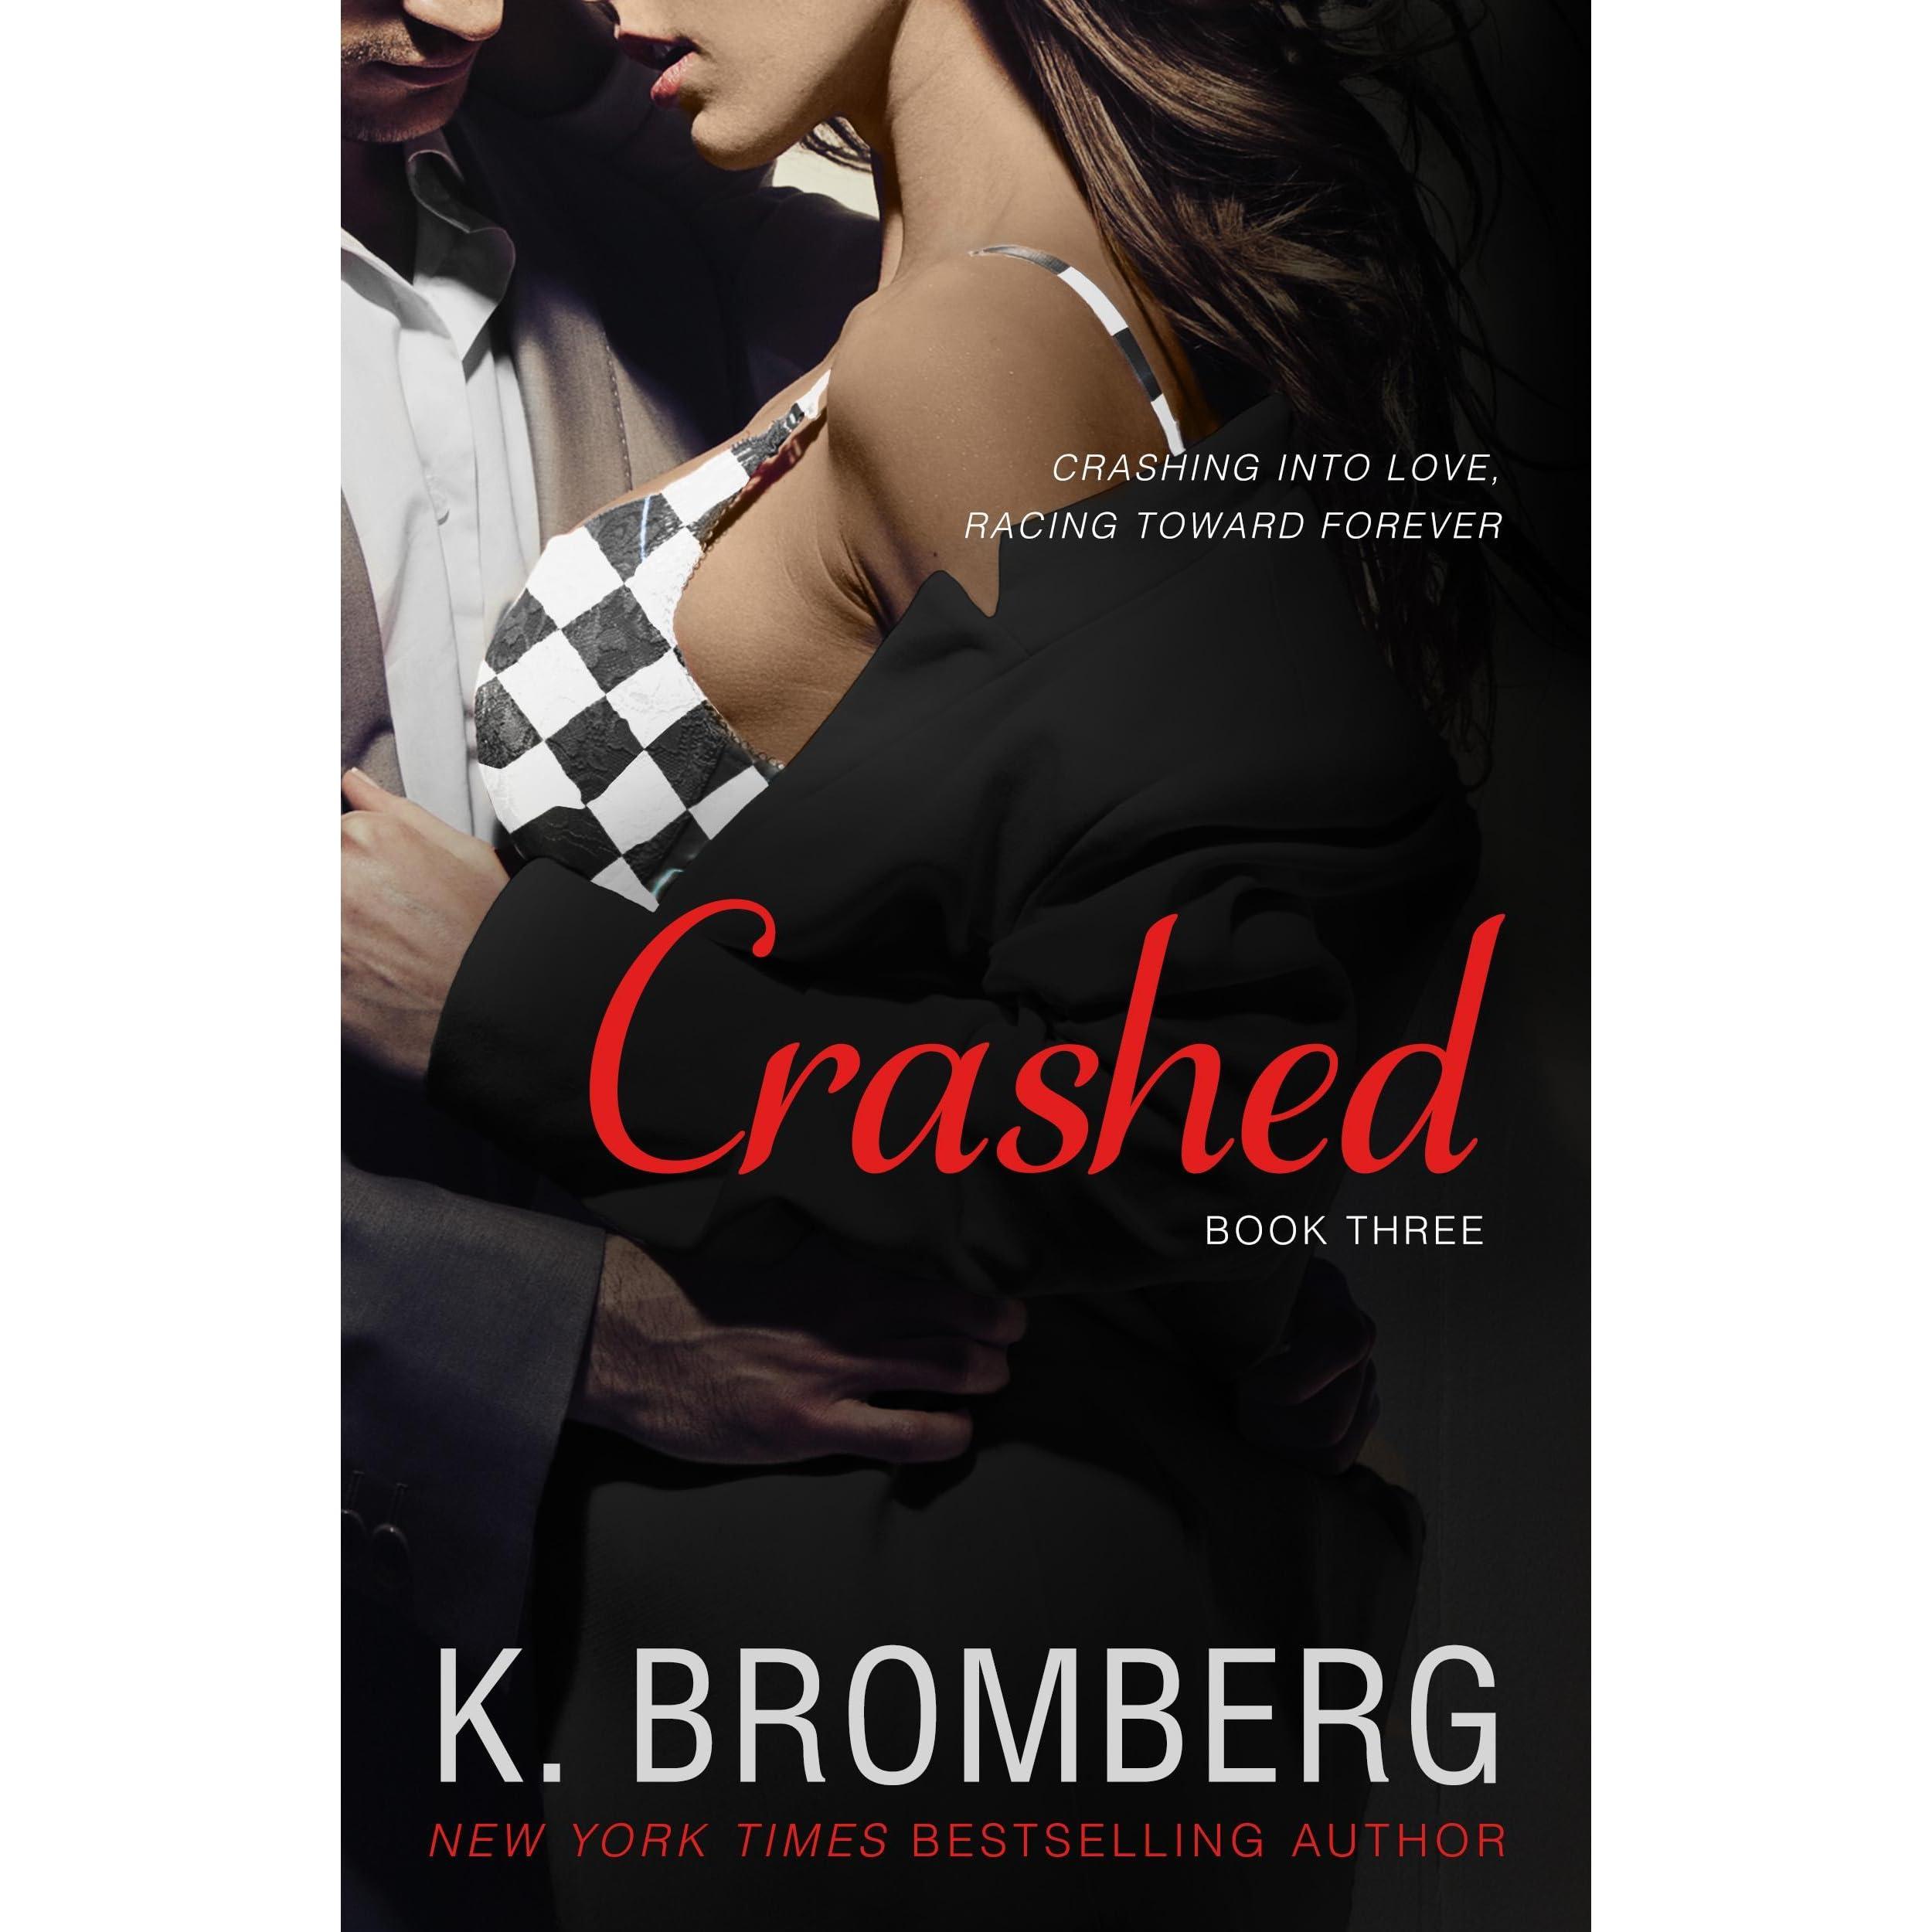 K bromberg pdf crashed